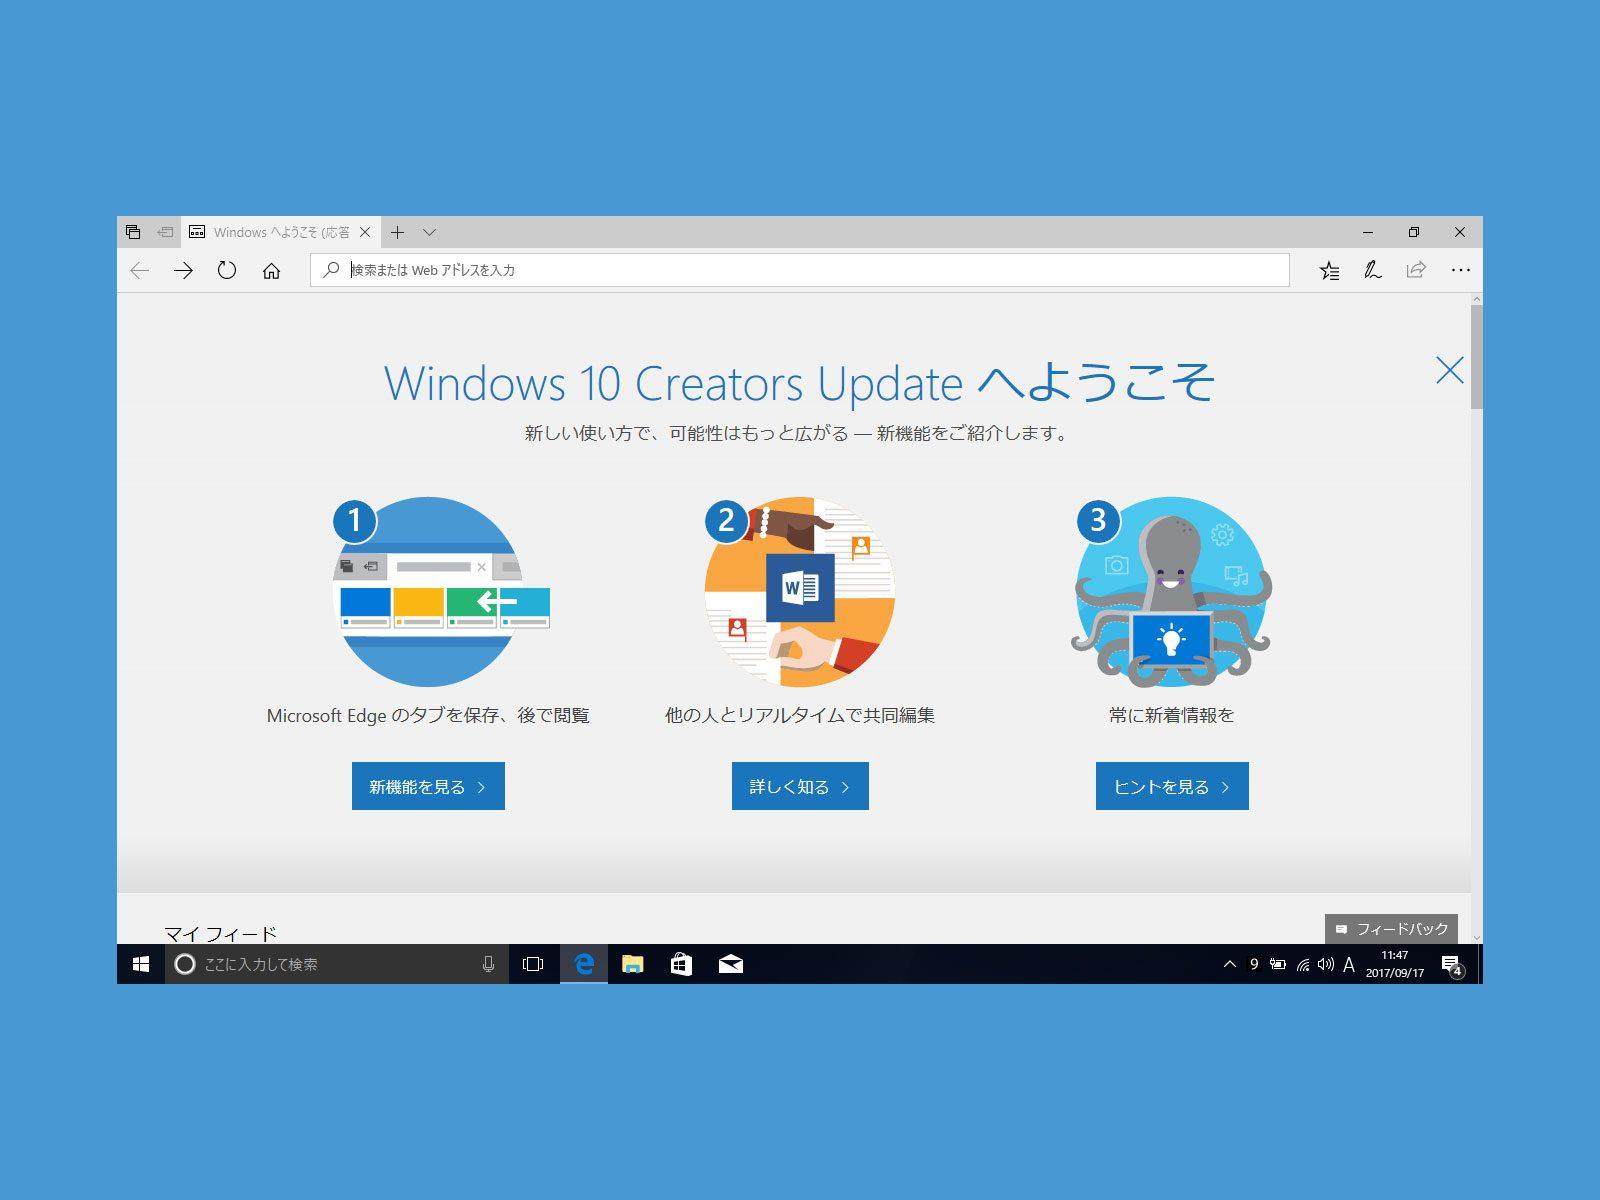 windows10creatorsUpdateファースト画面